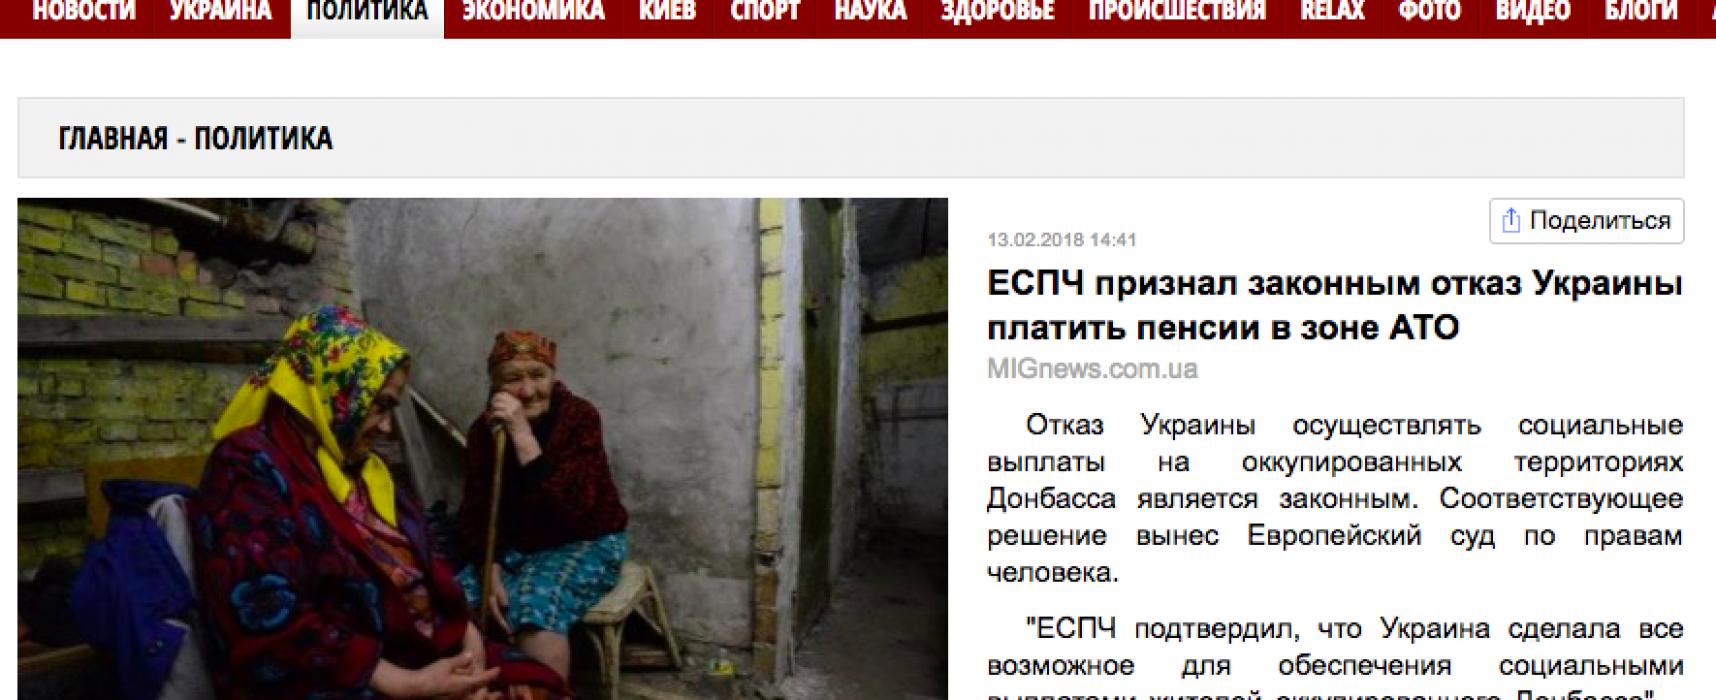 Фейк: Европа оставила Донбас без пенсии – допълнено